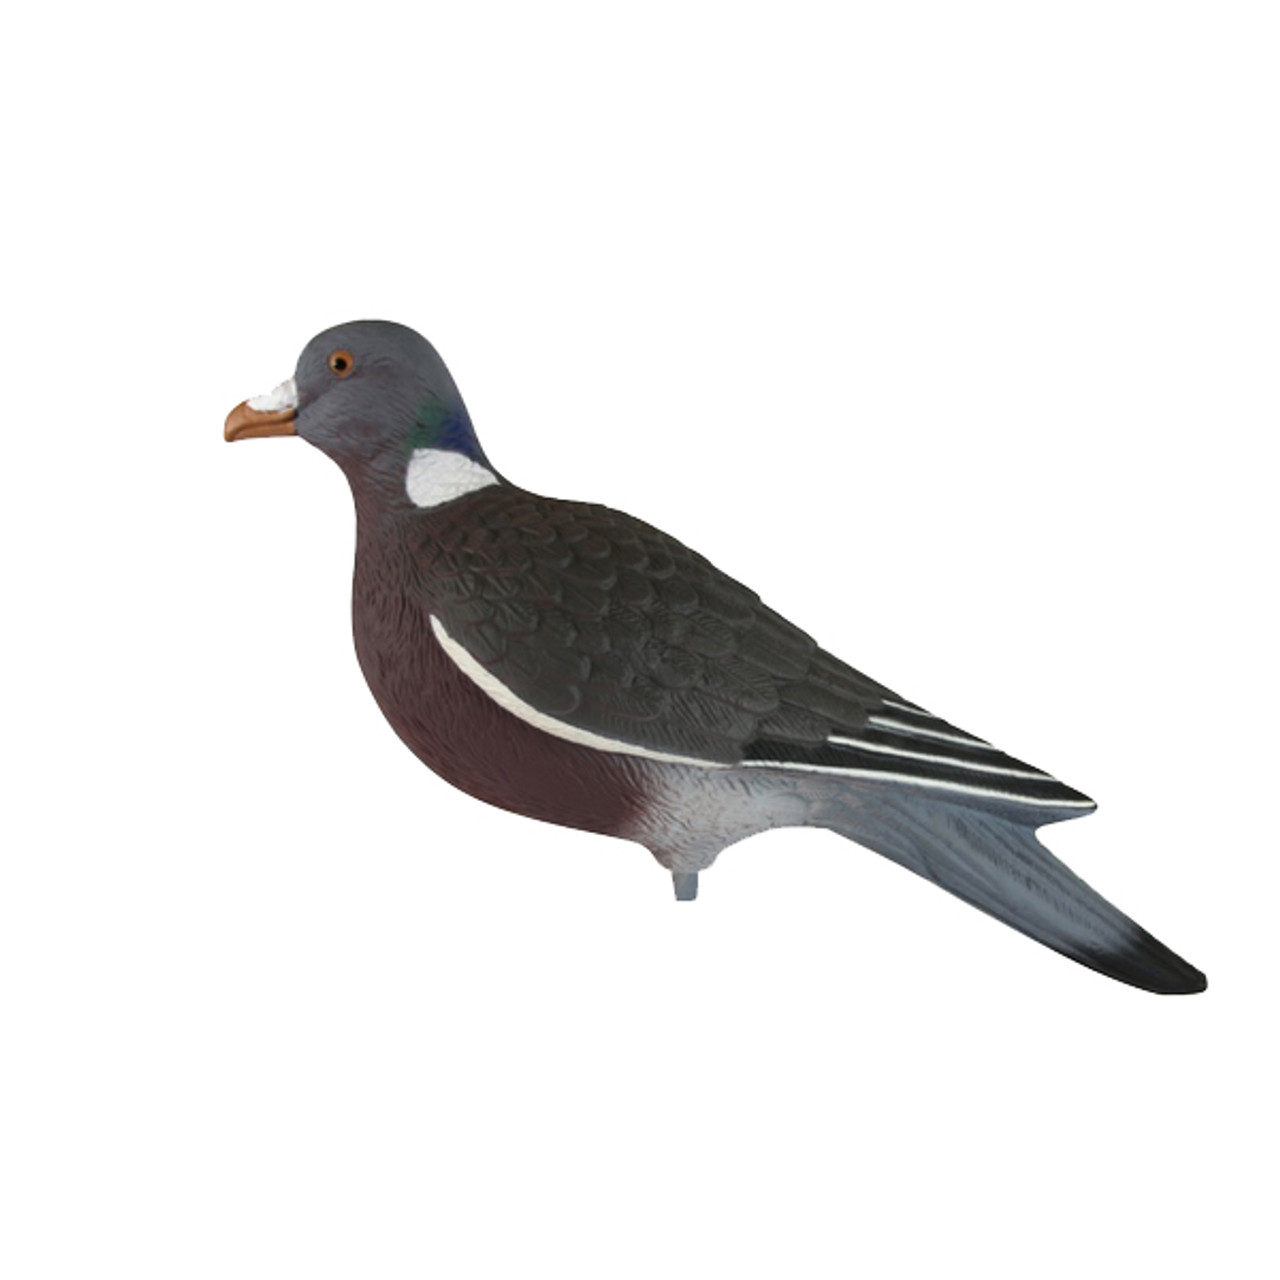 Enforcer Flying Pigeon Decoys 2pk